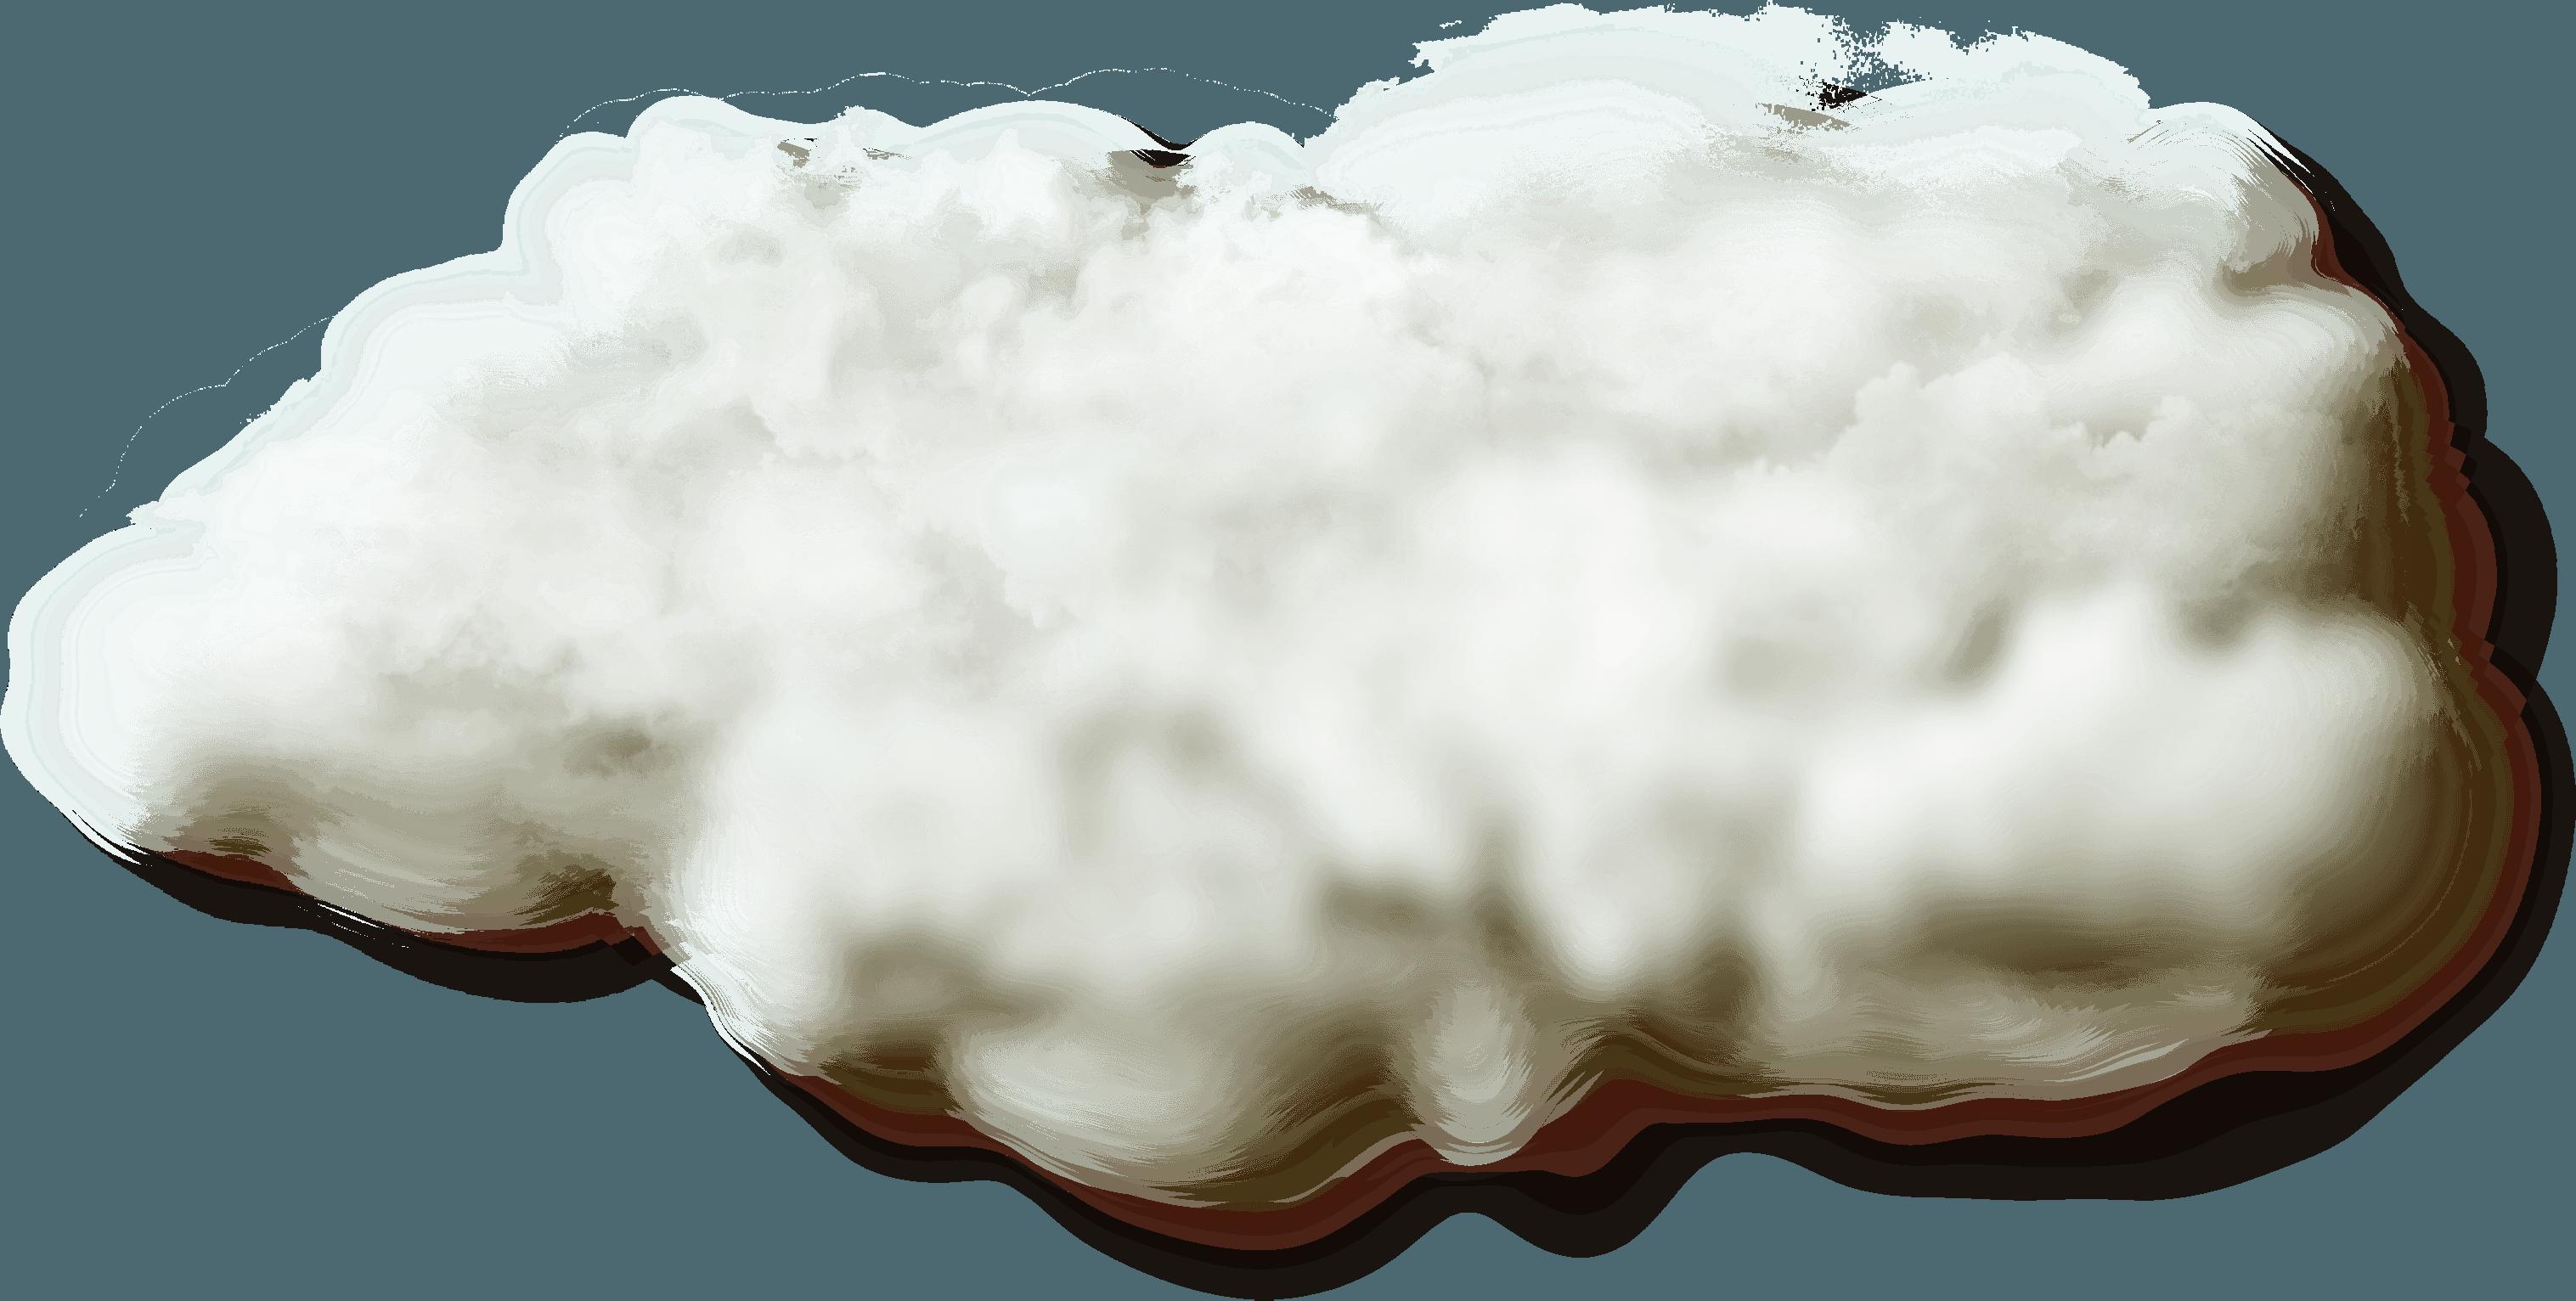 Download Hd Cloud Image In 2020 Fish In A Bag Clouds Logo Design Template